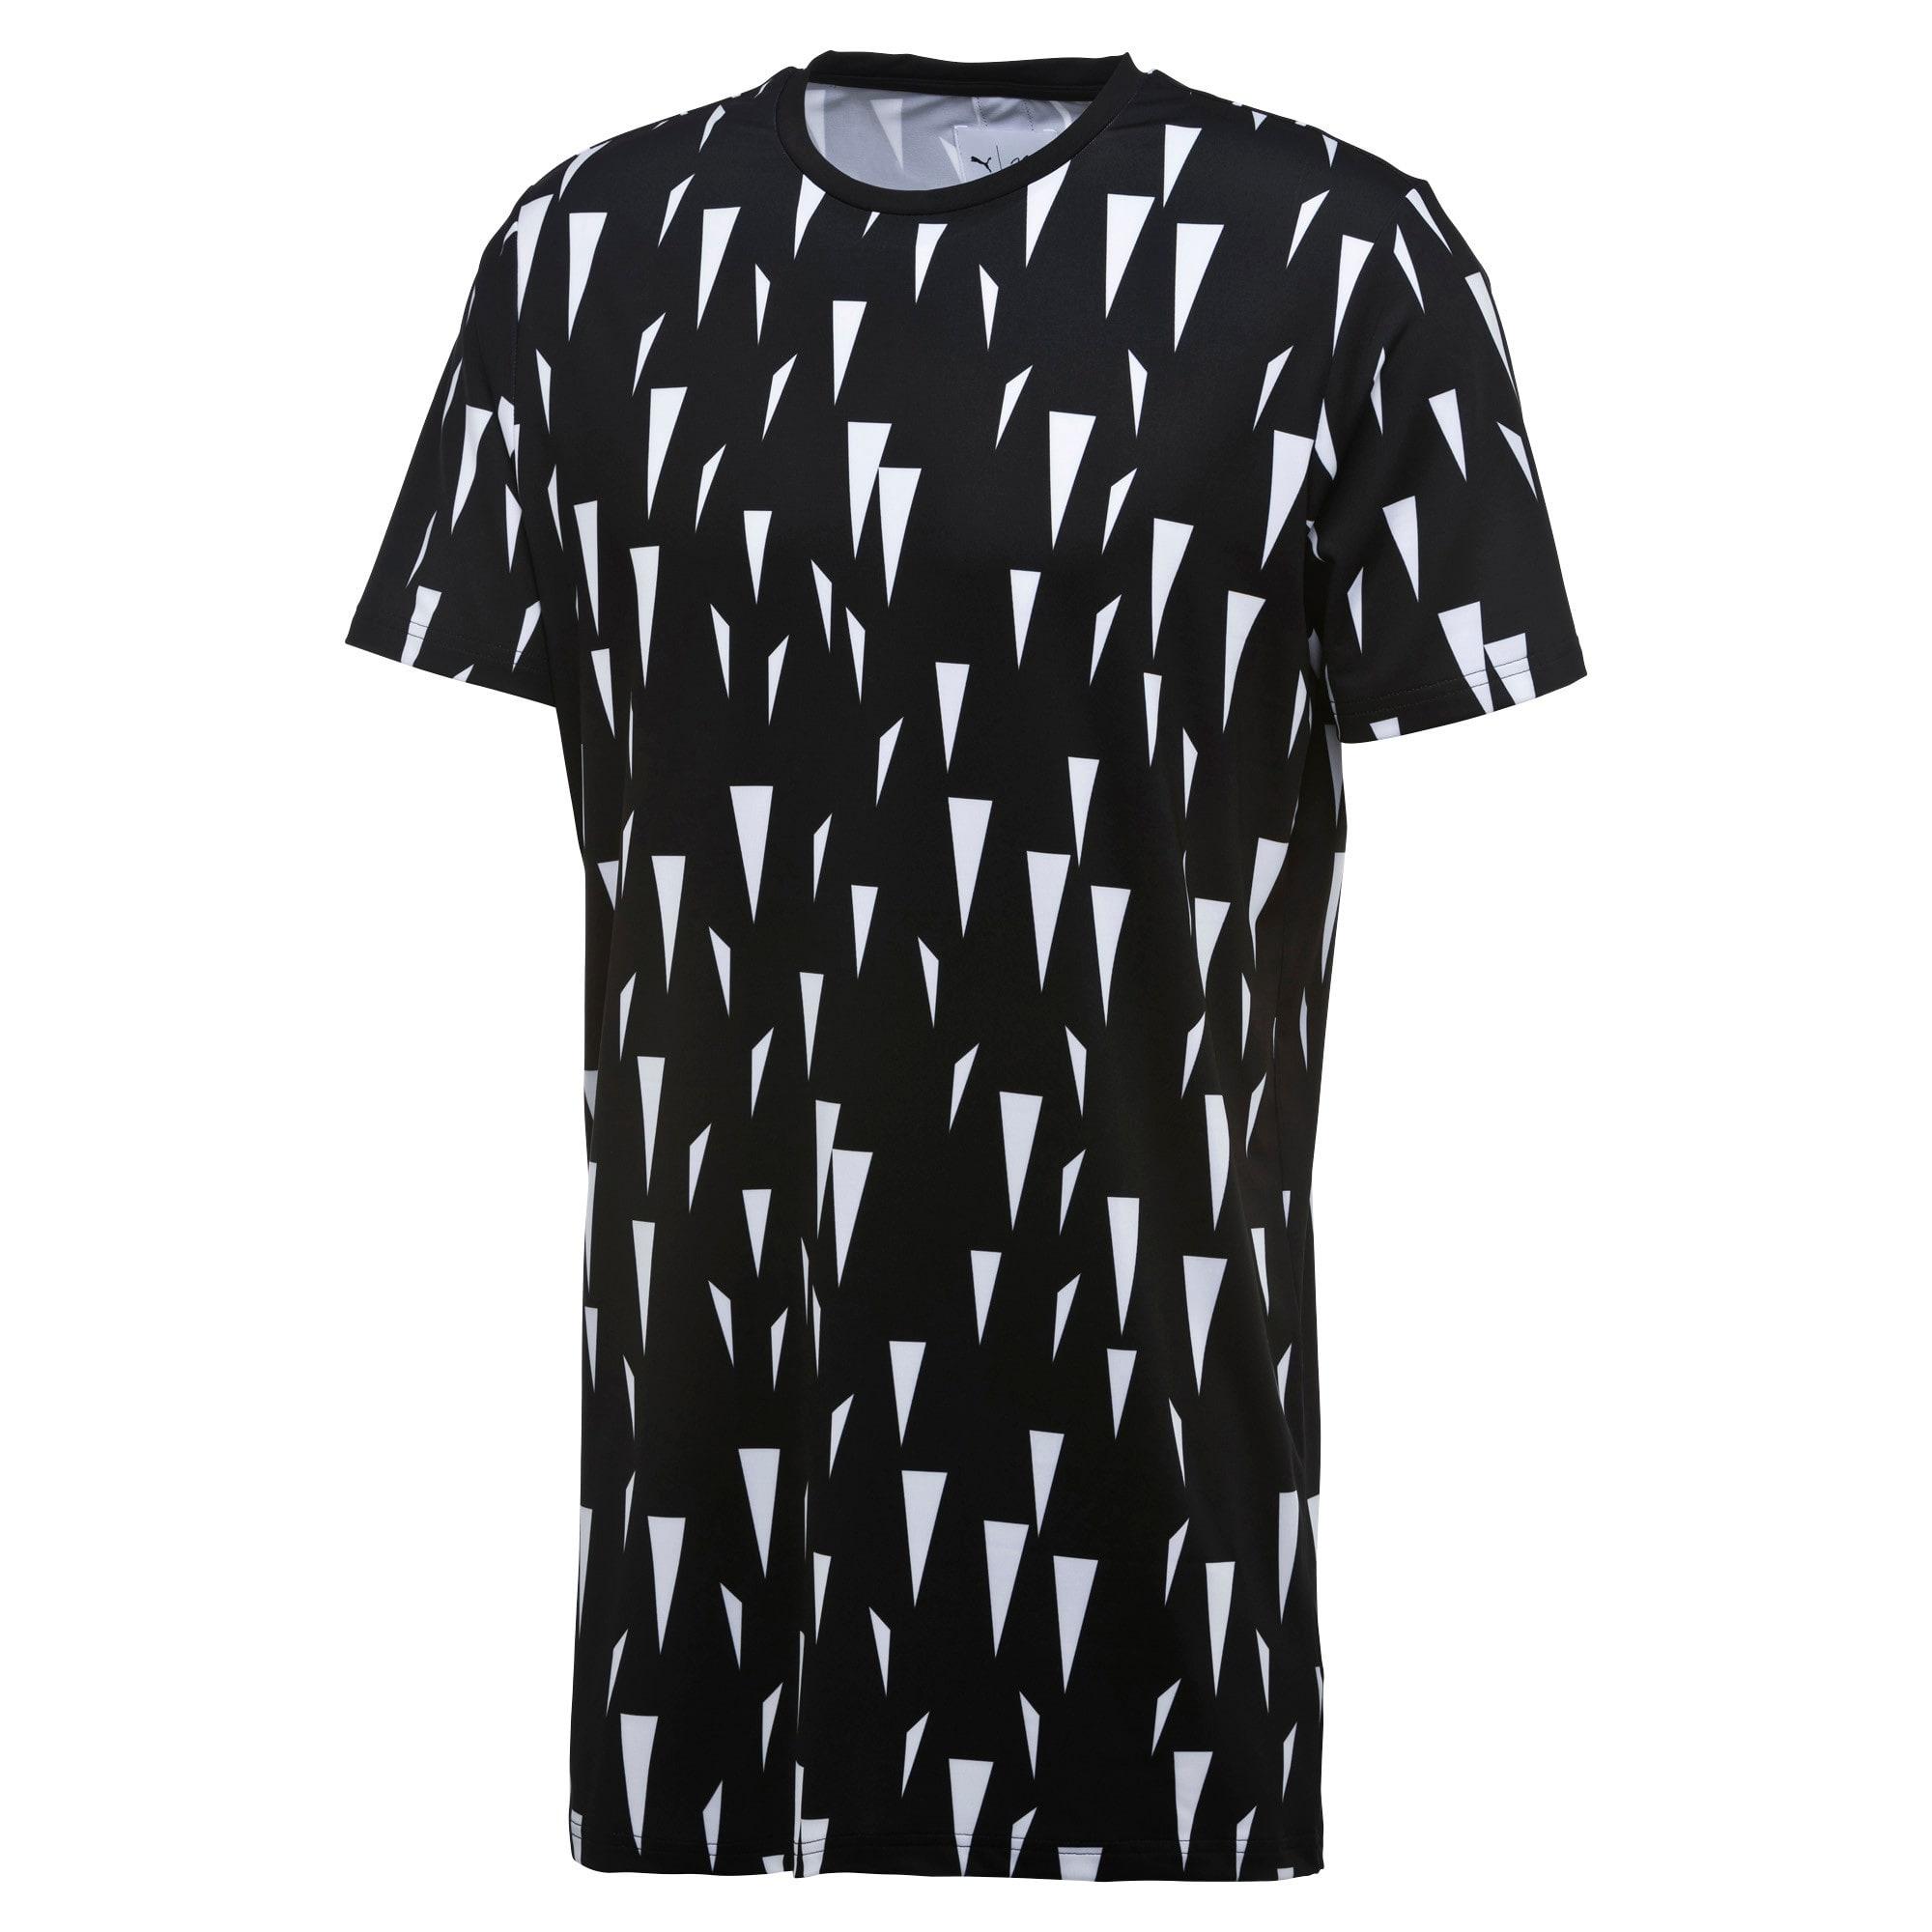 size 40 dc4d4 ed5cd PUMA X NATUREL Men's Tech T-Shirt